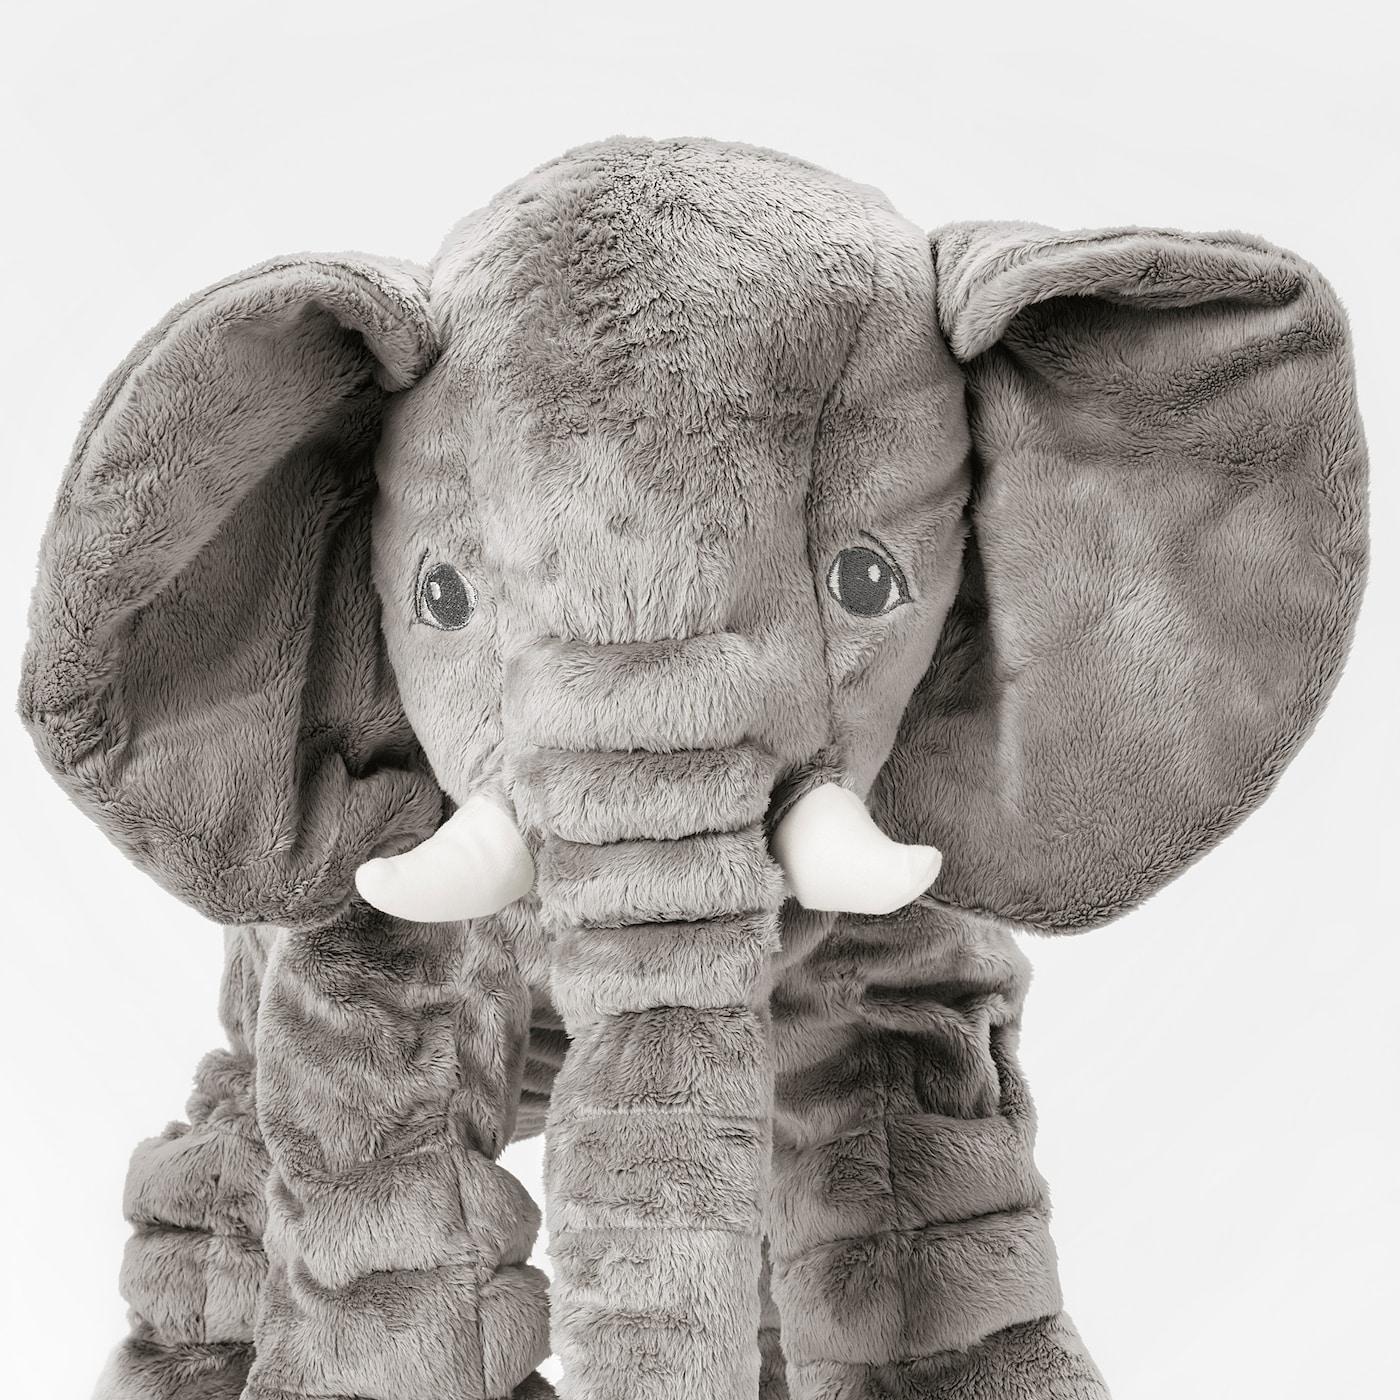 JÄTTESTOR Stoffspielzeug Elefant/grau 60 cm